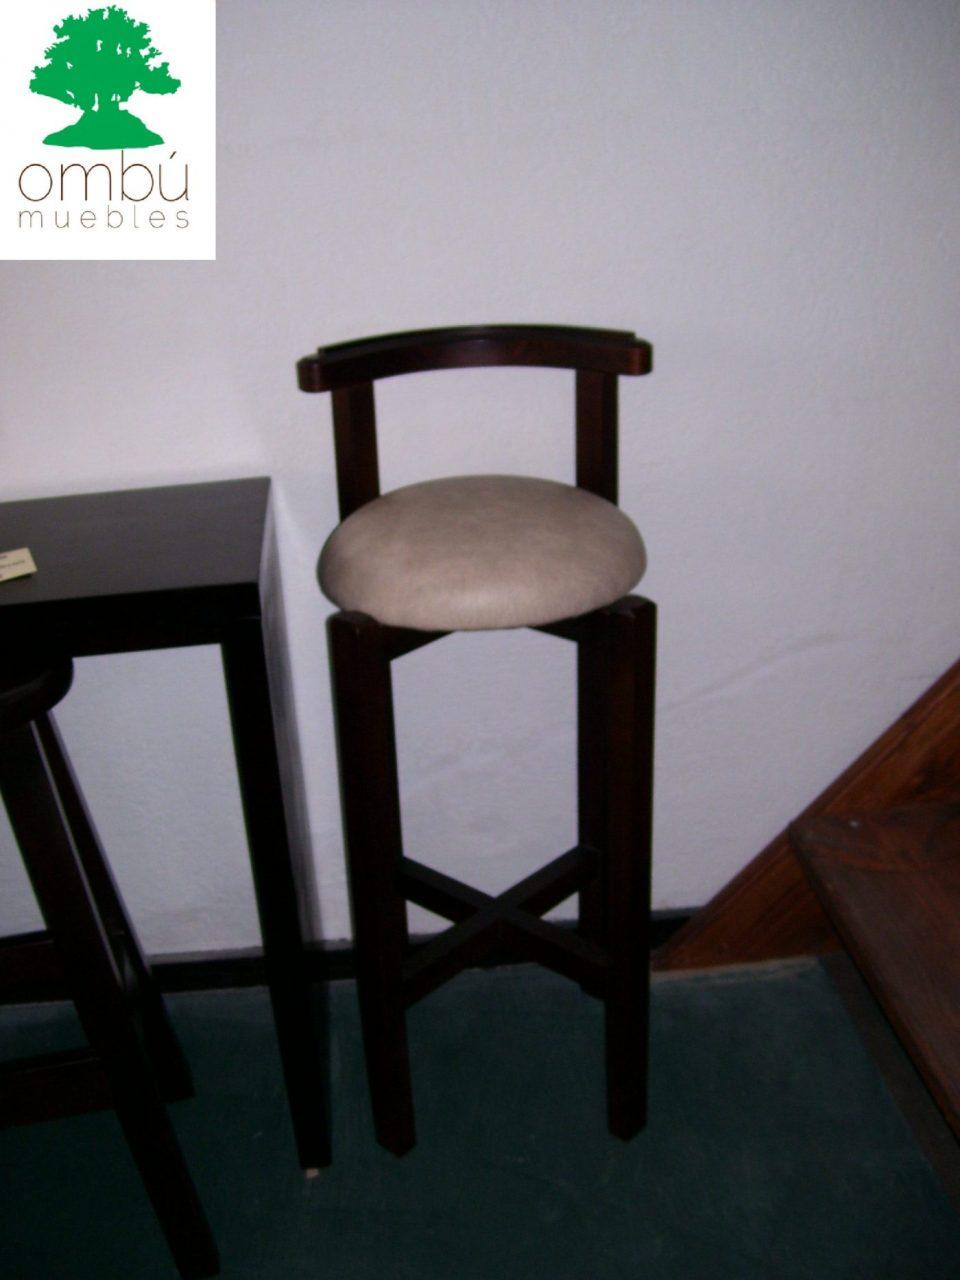 Butacas para bares en madera omb muebles uruguay for Butacas para barras en madera